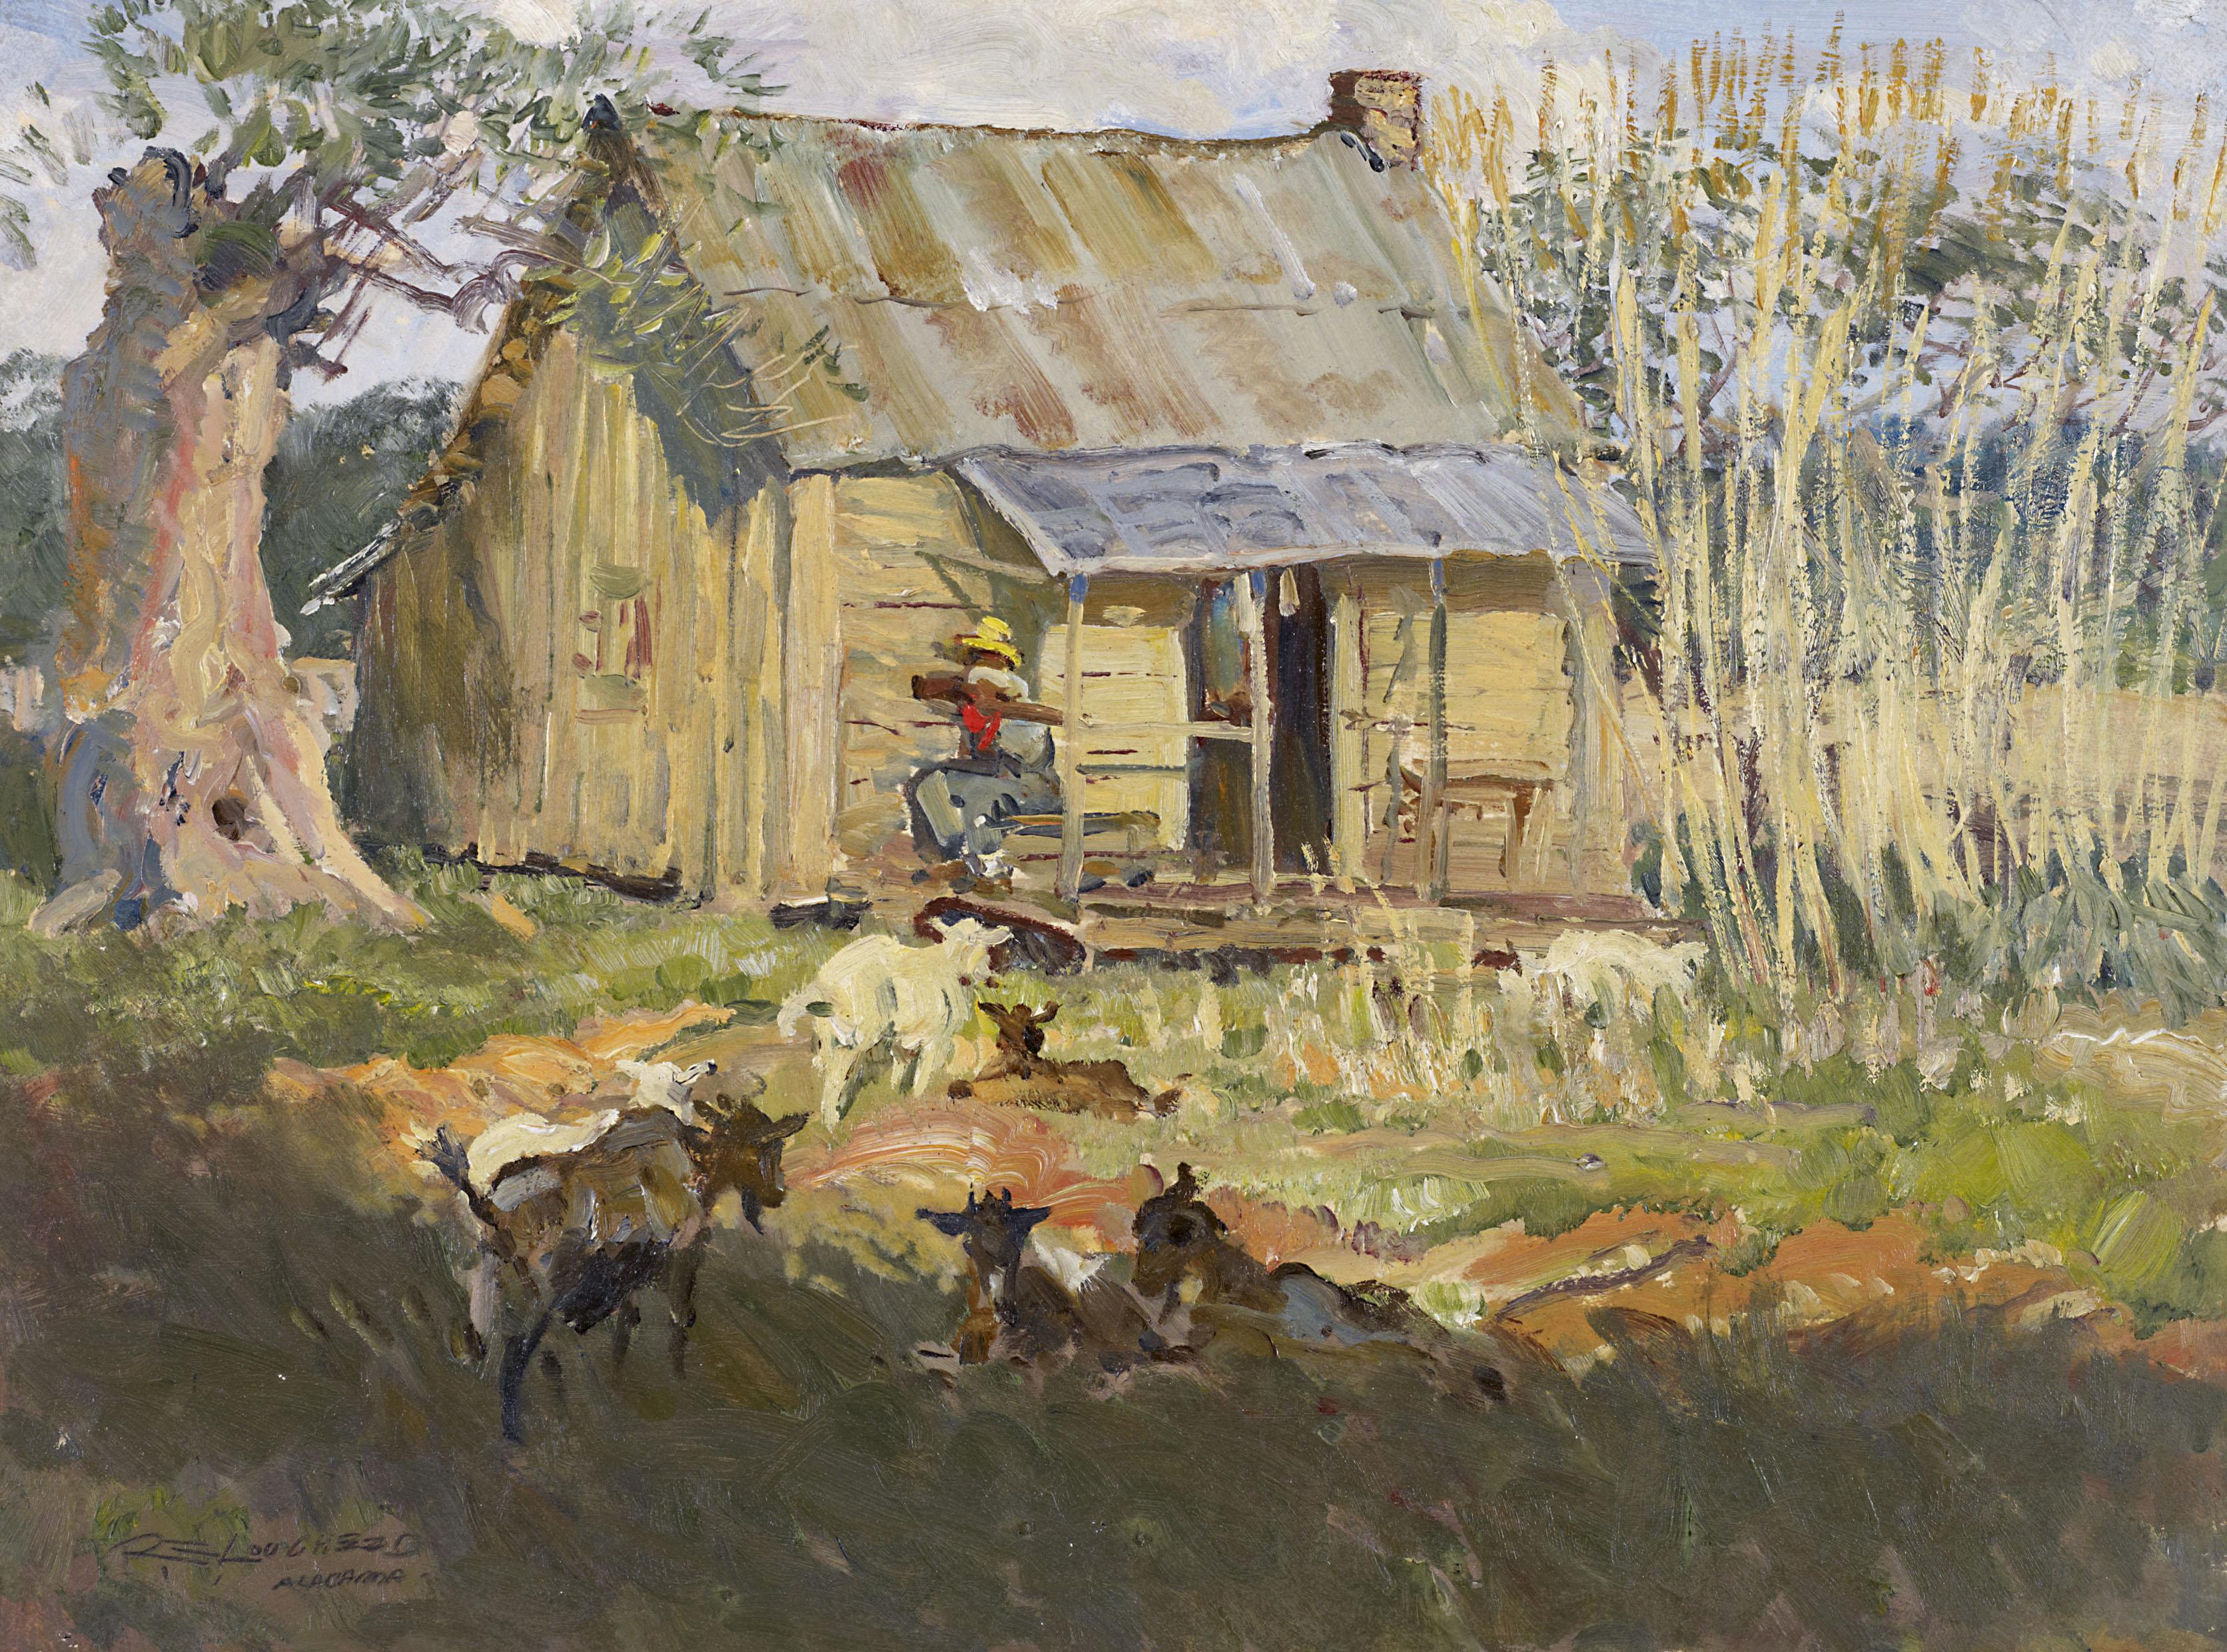 Alabama Daydream by  Robert Lougheed - Masterpiece Online